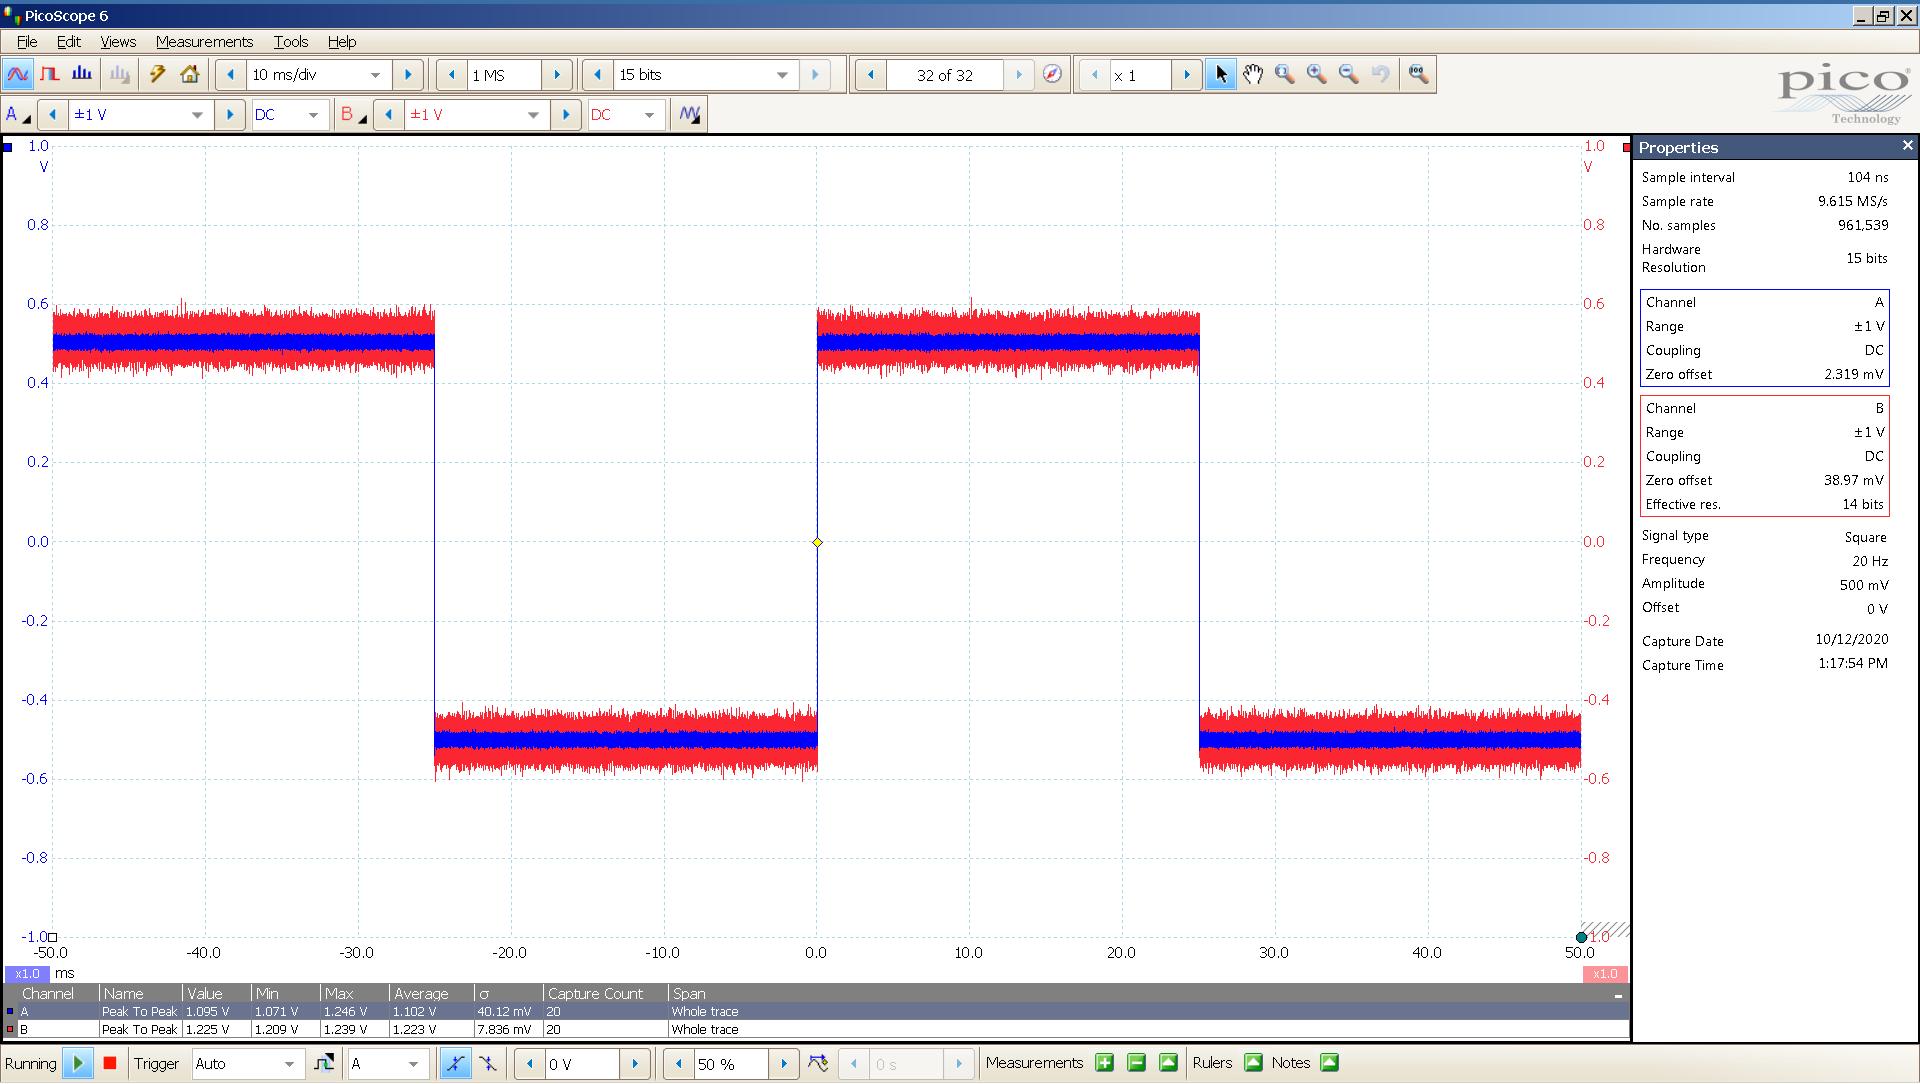 20201012 CT2593-210x  ch A  DP10013 50x ch B sig gen 20 Hz sqr 10mS div.png